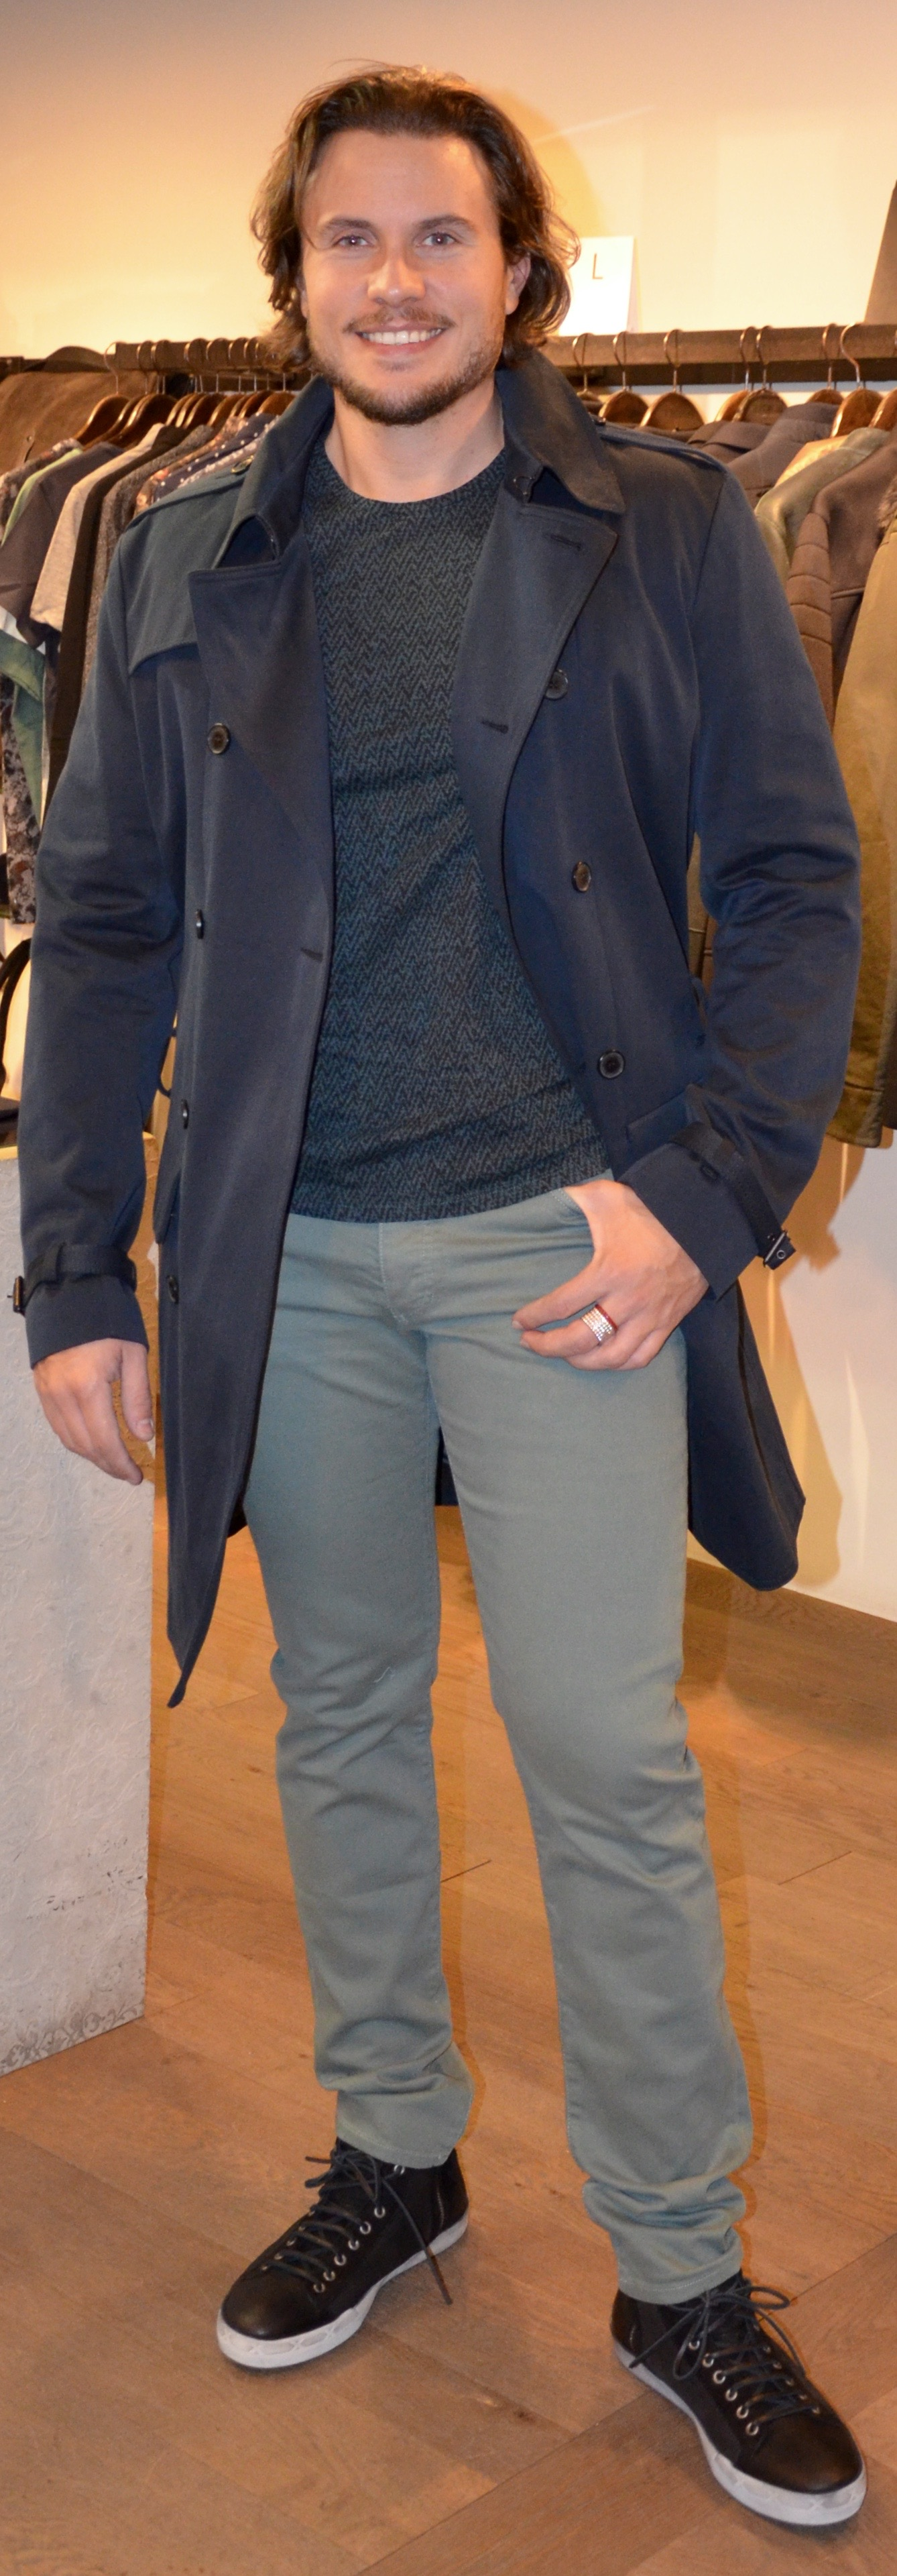 Relooking Masculin Annecy Genève